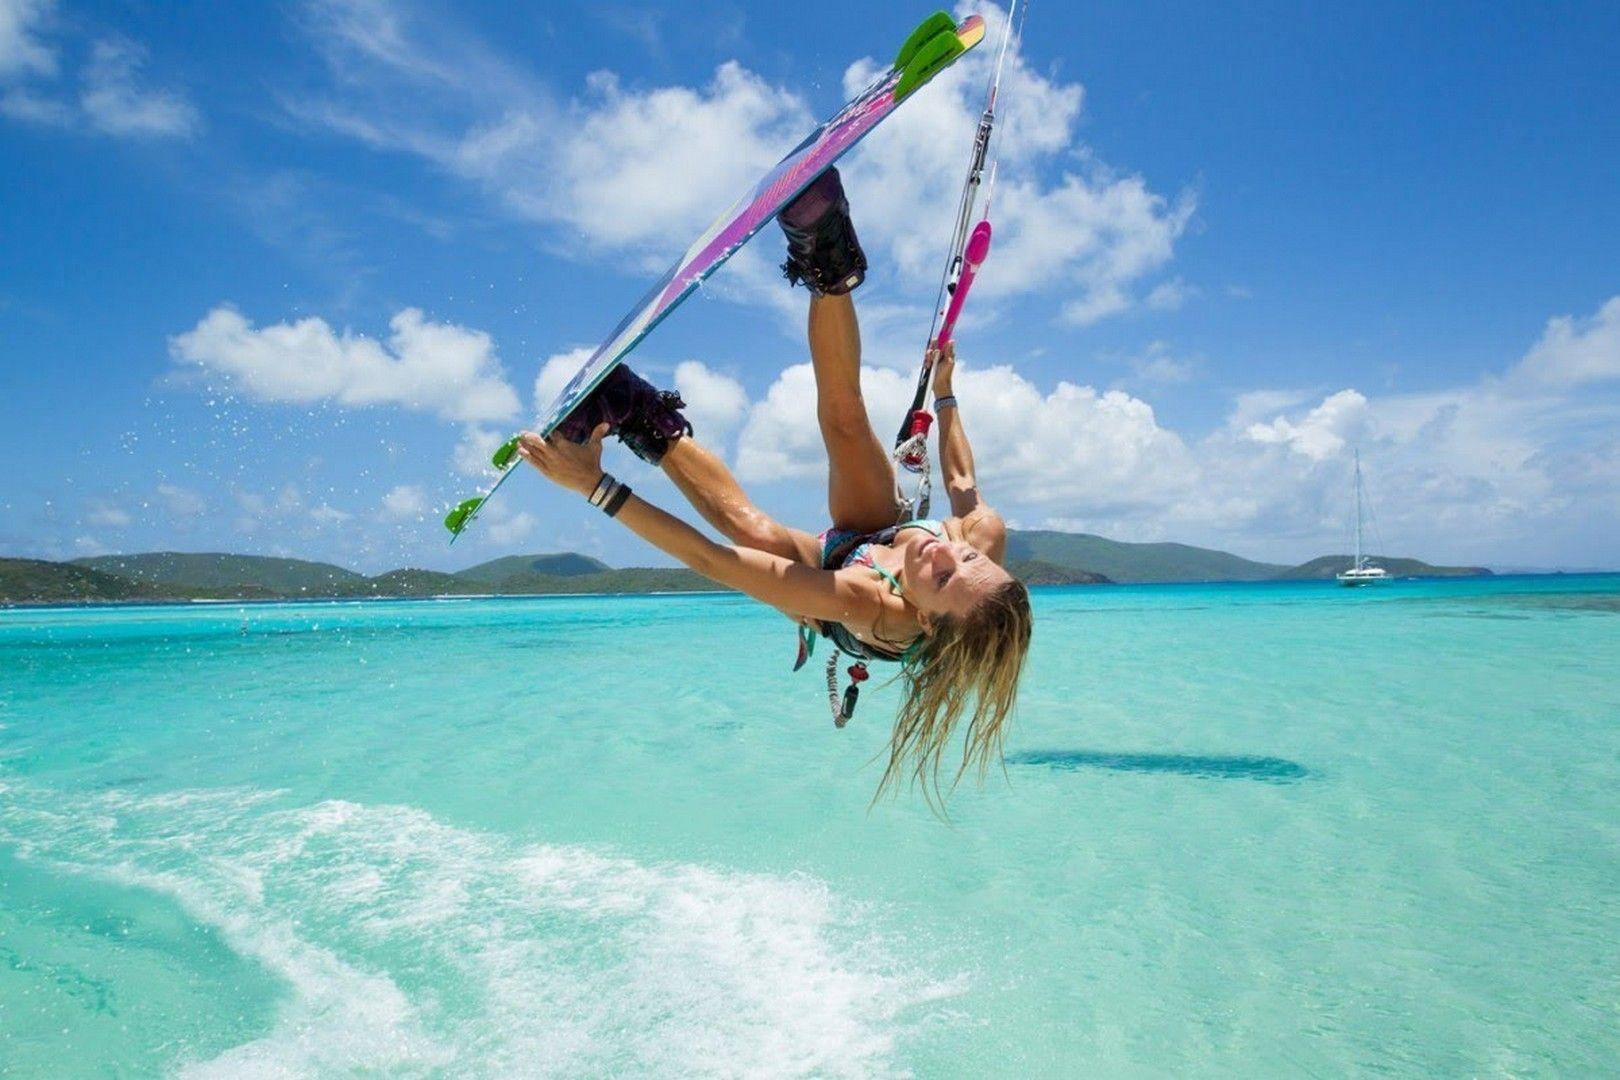 Du KiteSurf à Bali  Le Guide